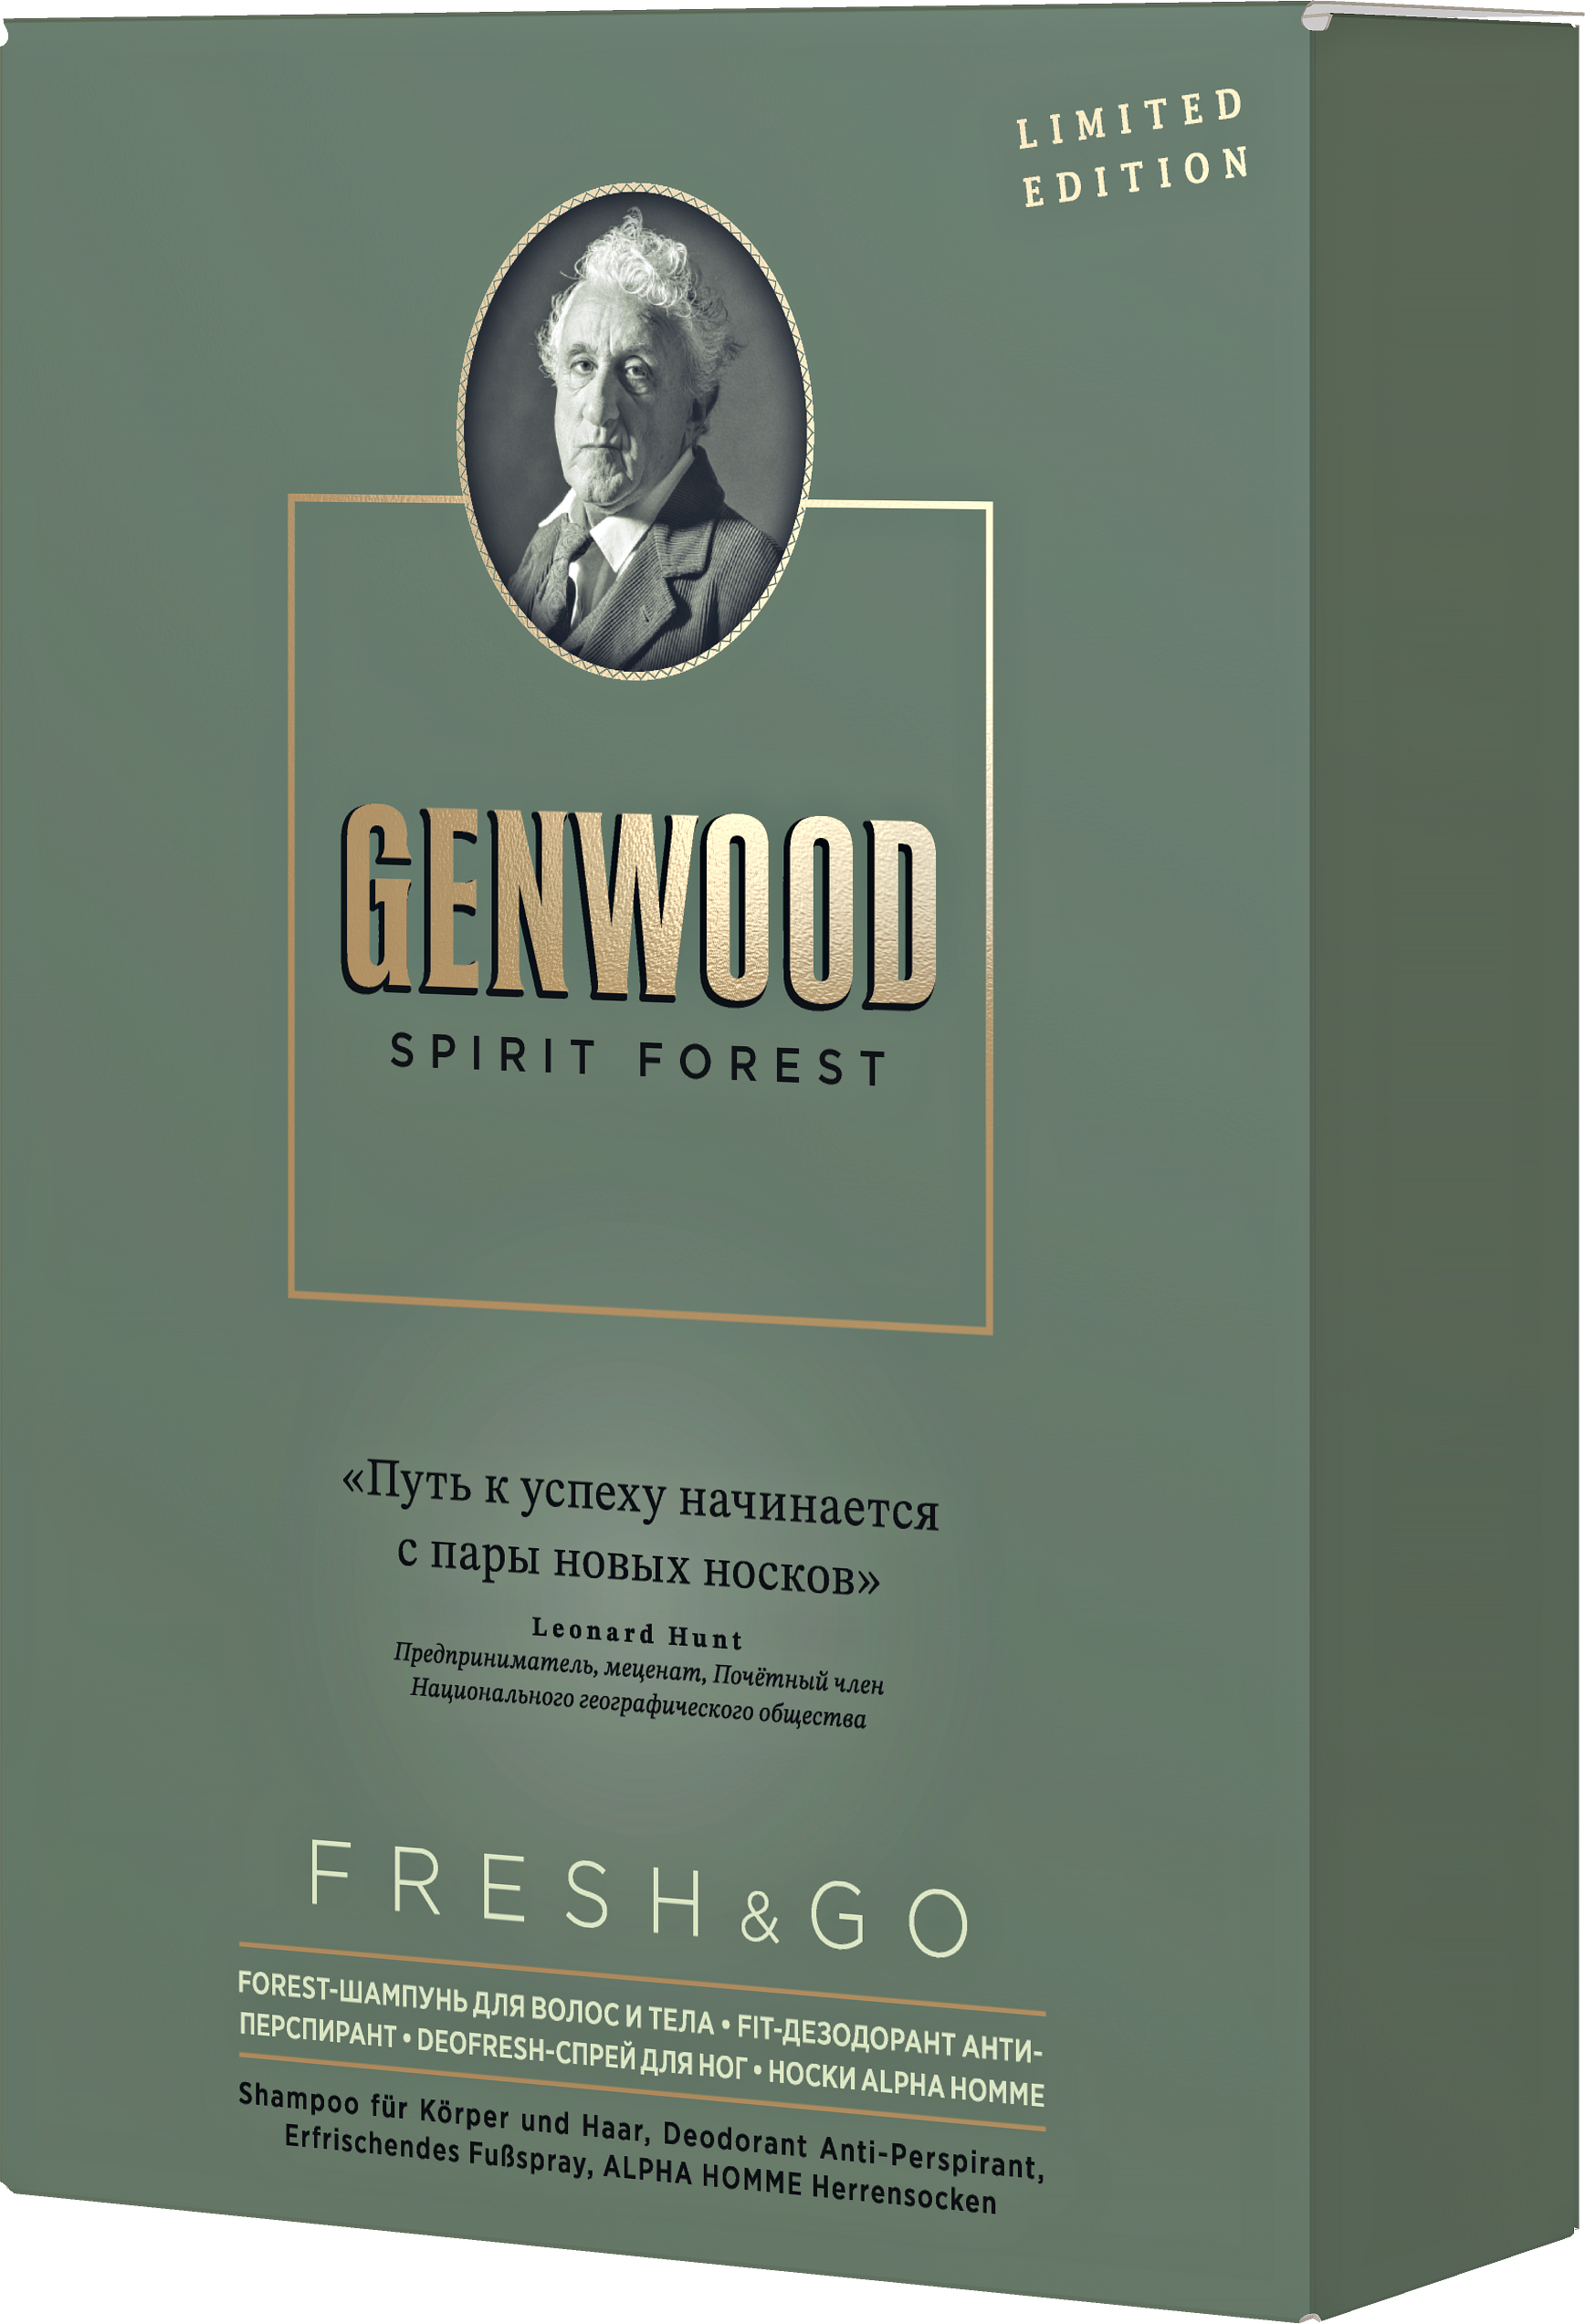 ESTEL PROFESSIONAL Набор для мужчин (шампунь, дезодорант, спрей для ног, носки ALPHA НOMME) / GENWOOD FRESH & GO фото